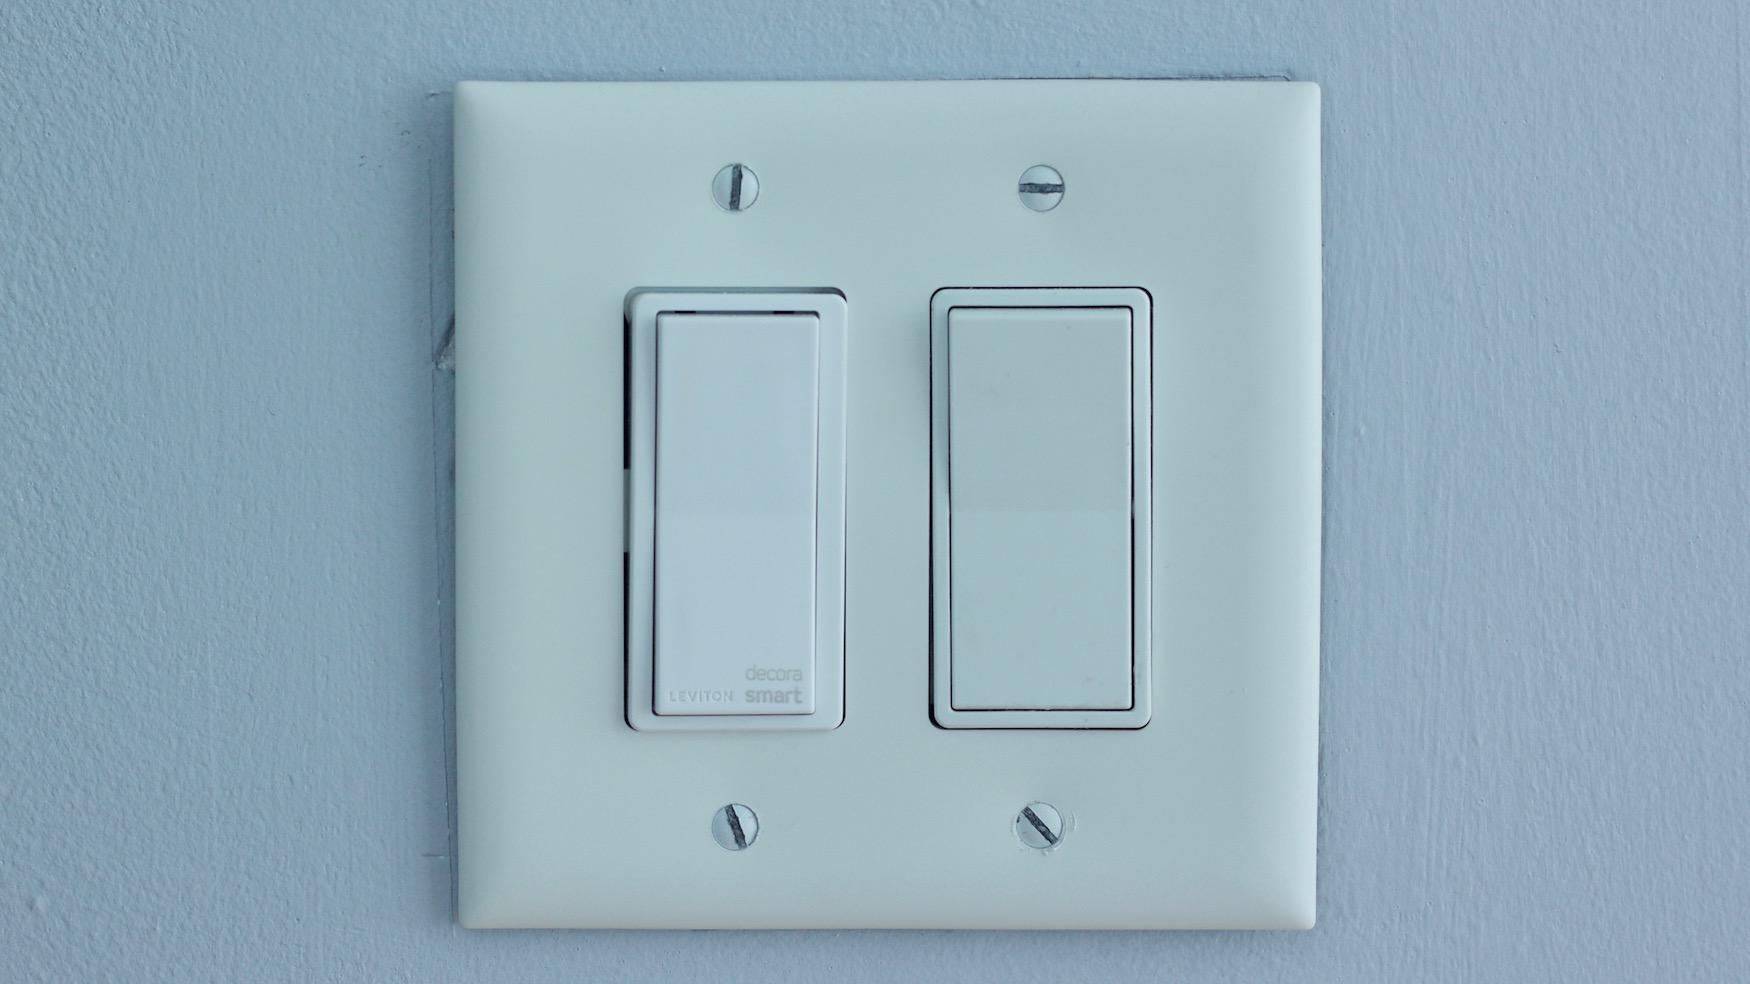 Switch Wiring Diagram In Addition Leviton 3 Way Switch Wiring Diagram